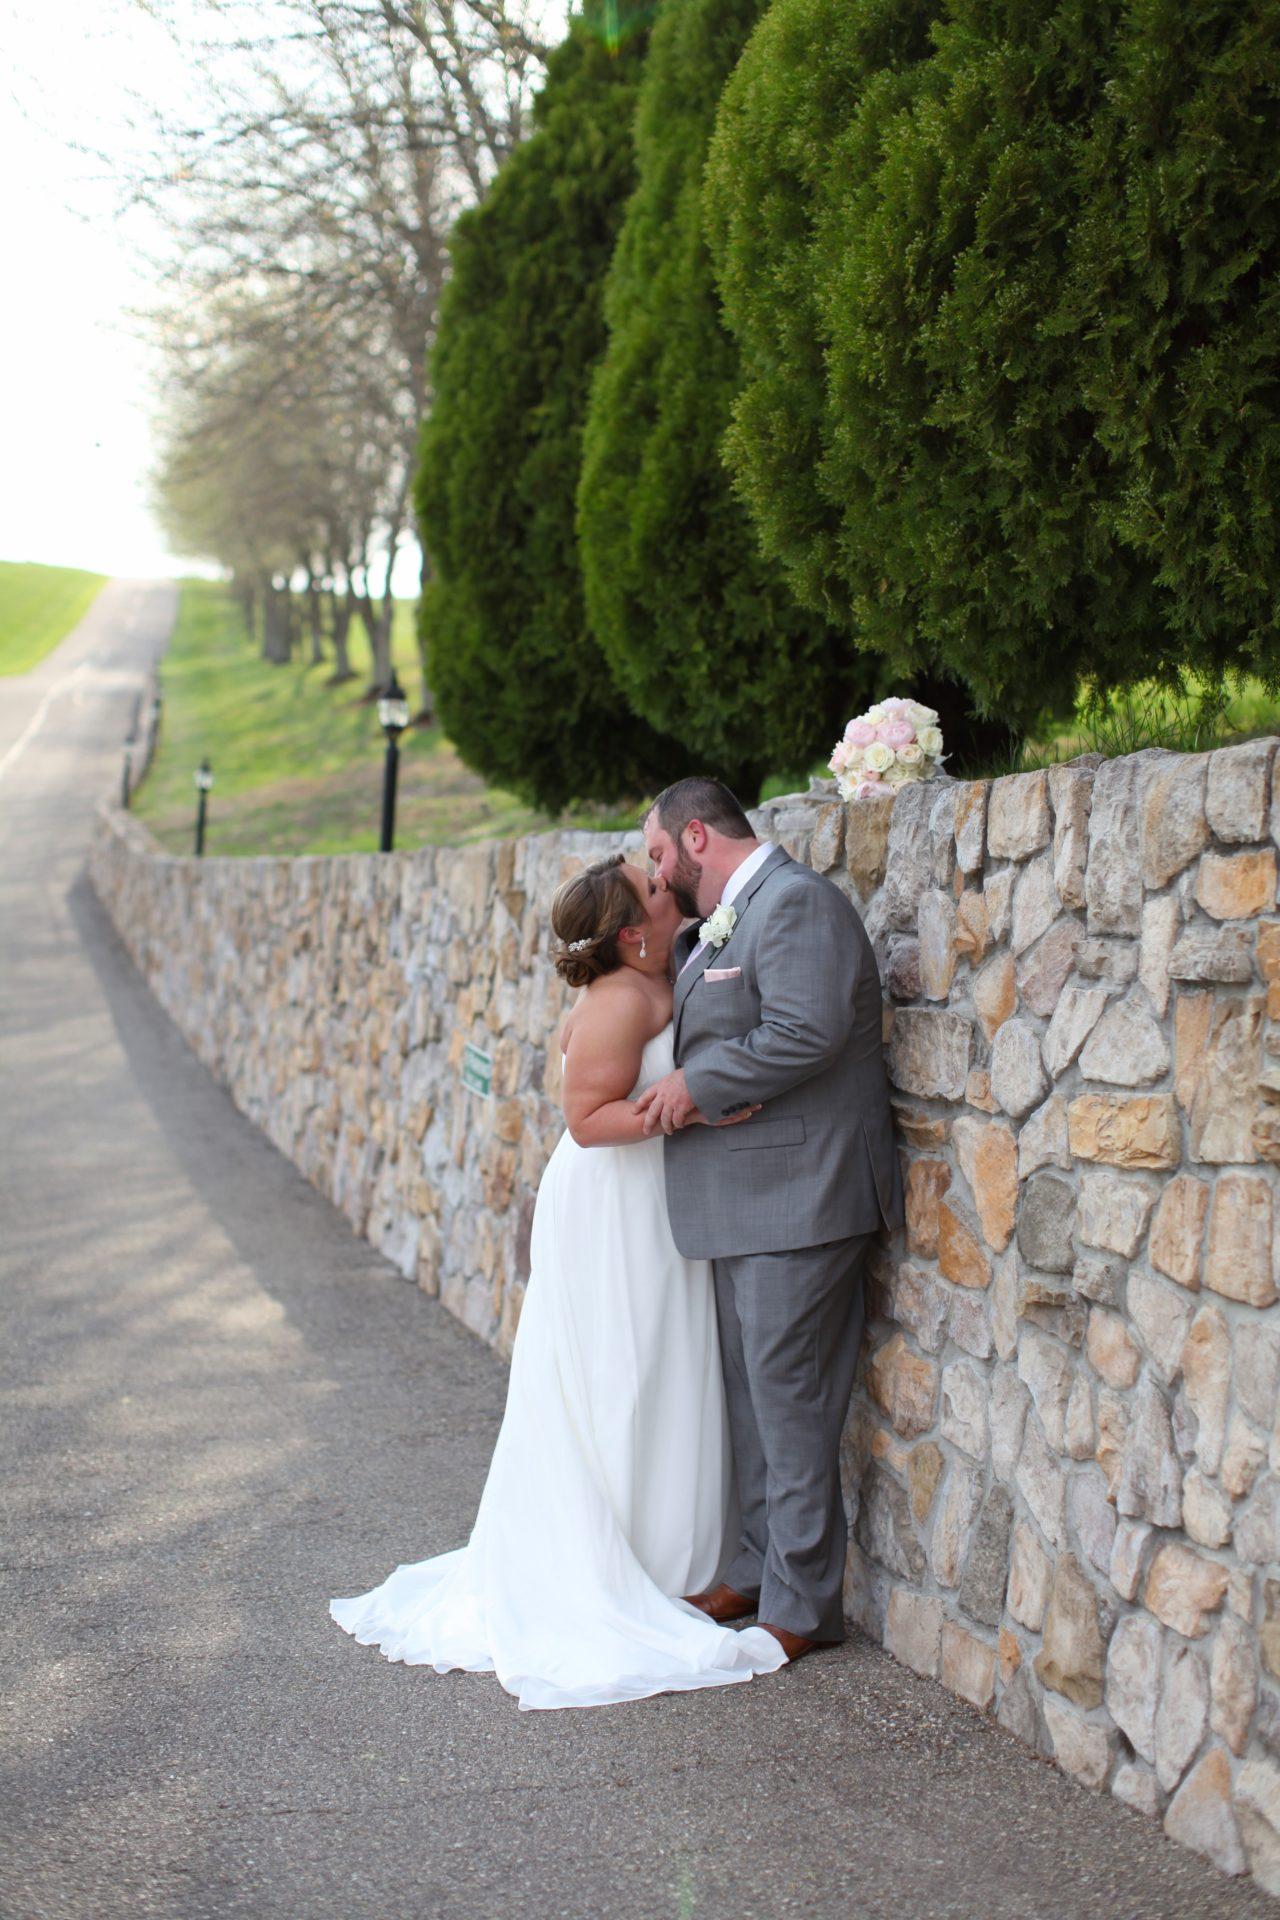 kiss by stone wall Sam & Amy's Wedding April 15 2017